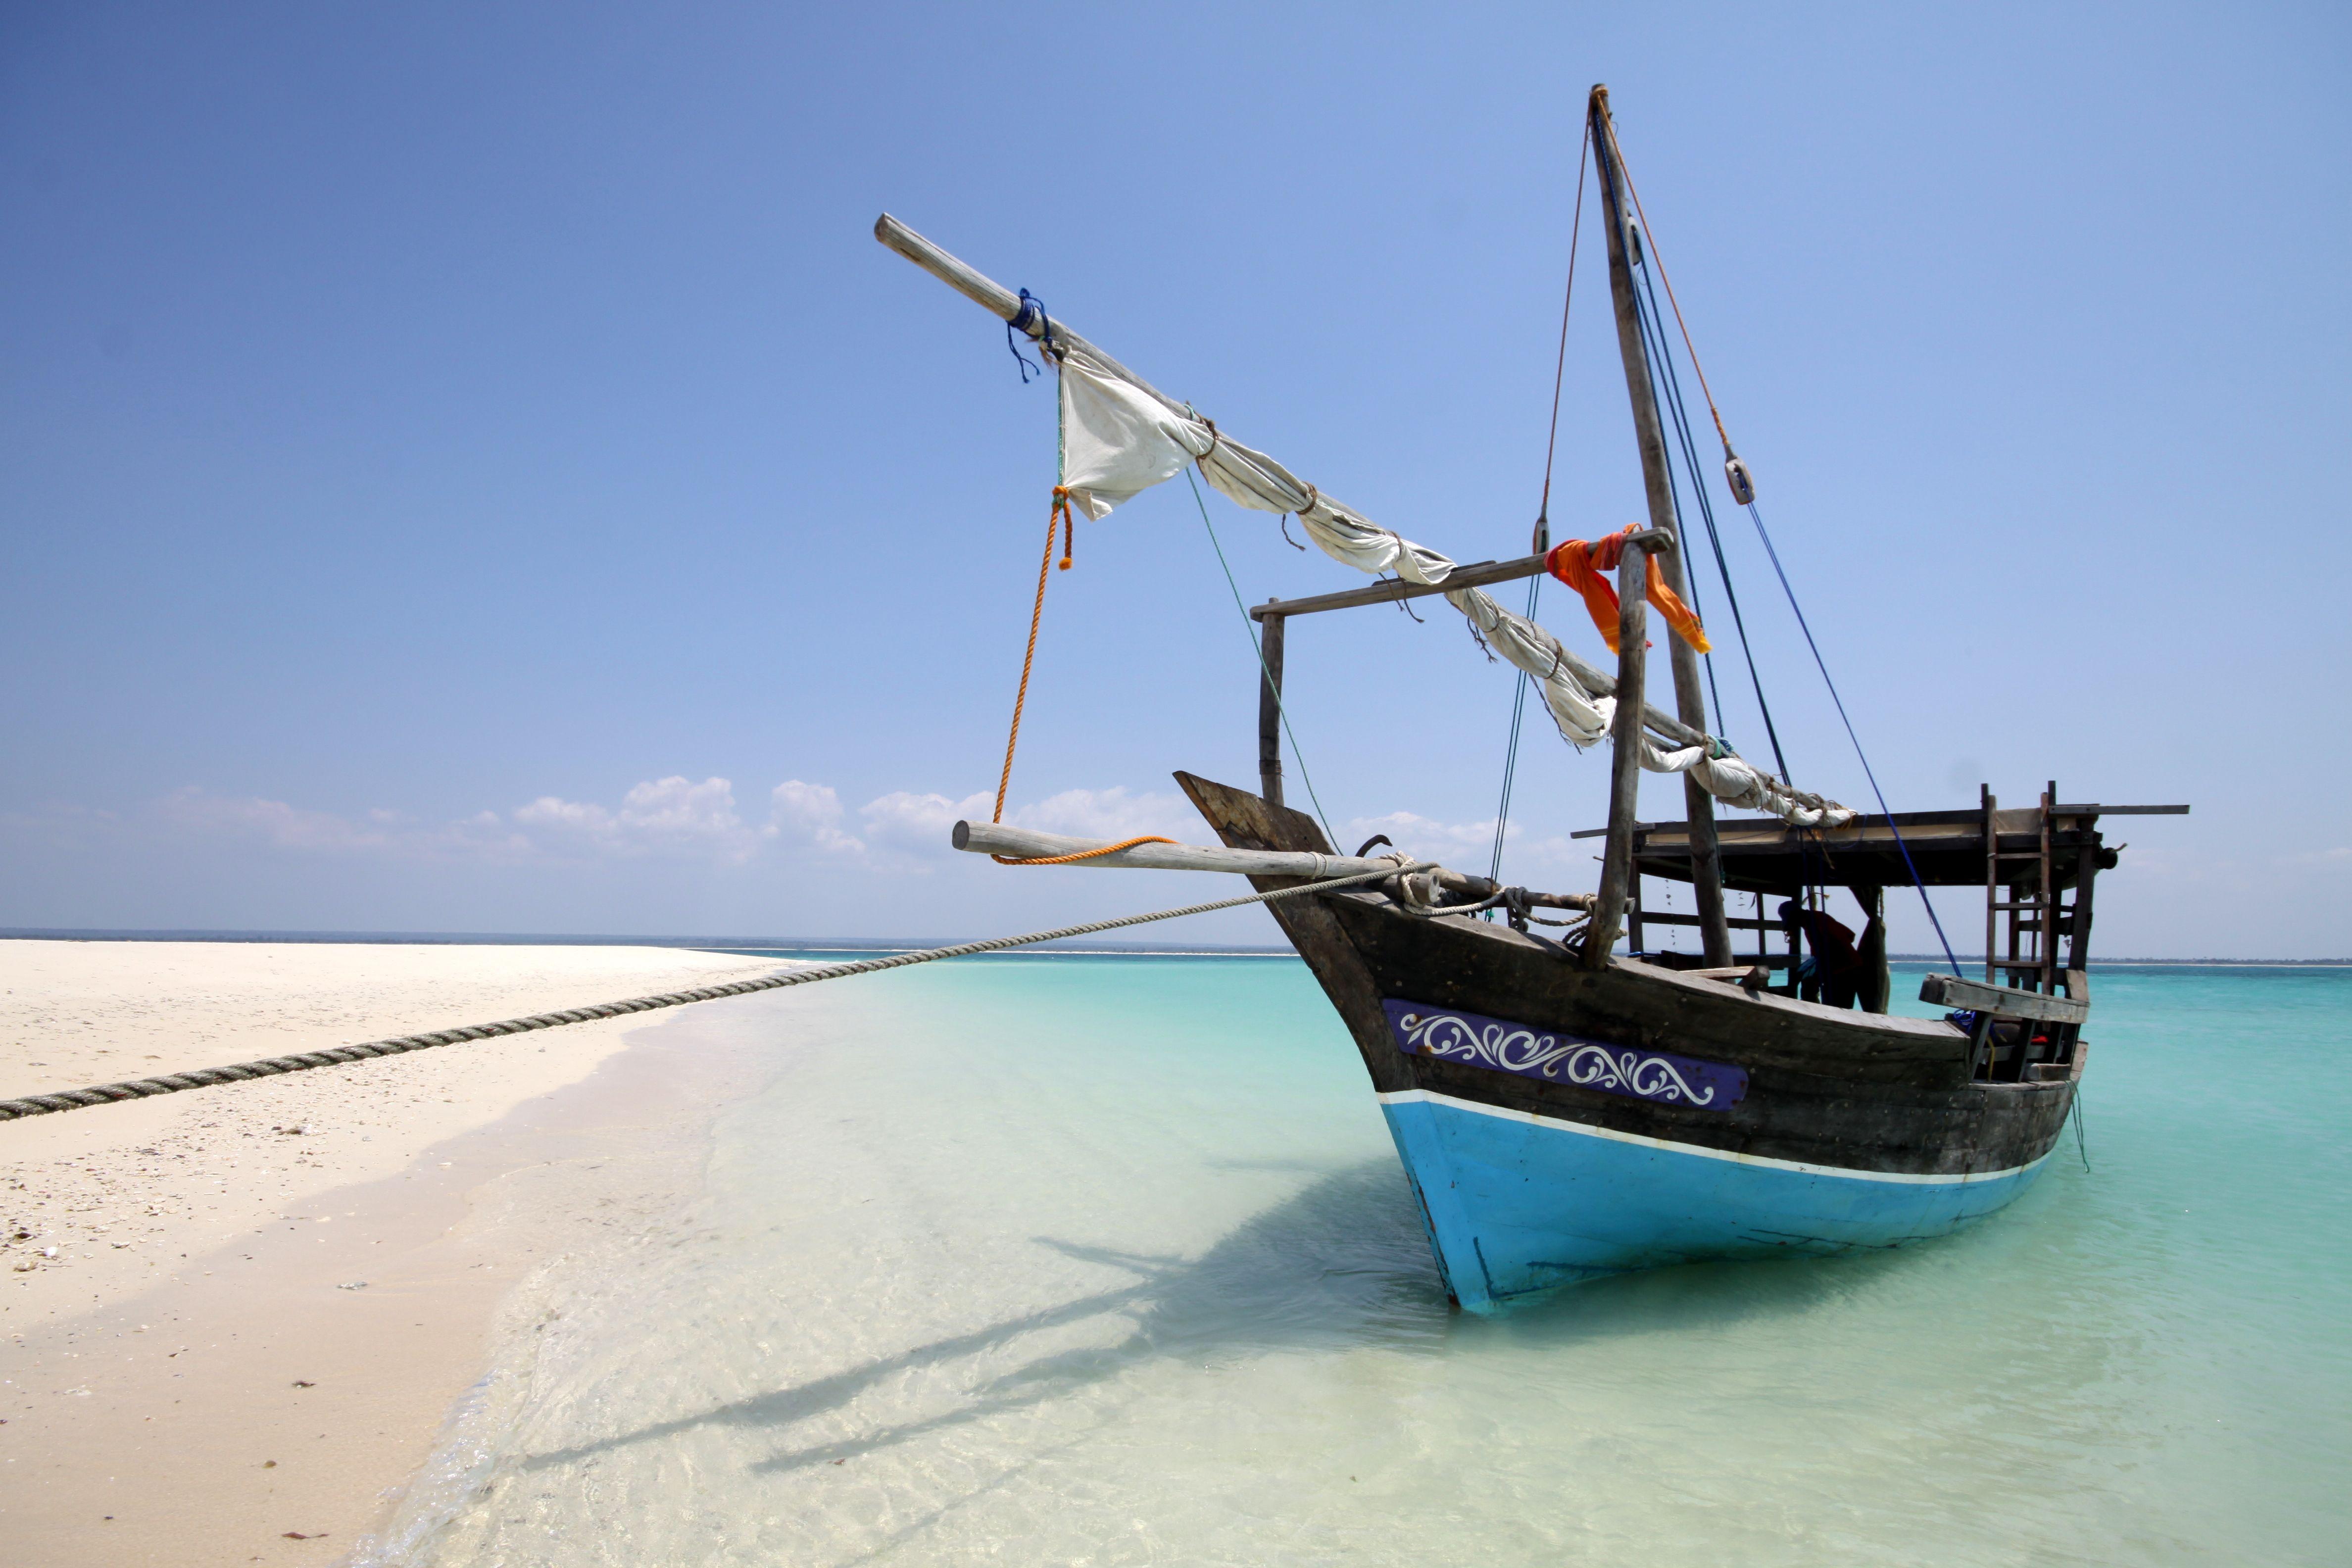 Pin Von Travellocal Auf Mosambik Das Land Des Lachelns Mosambik Tourismus Maputo